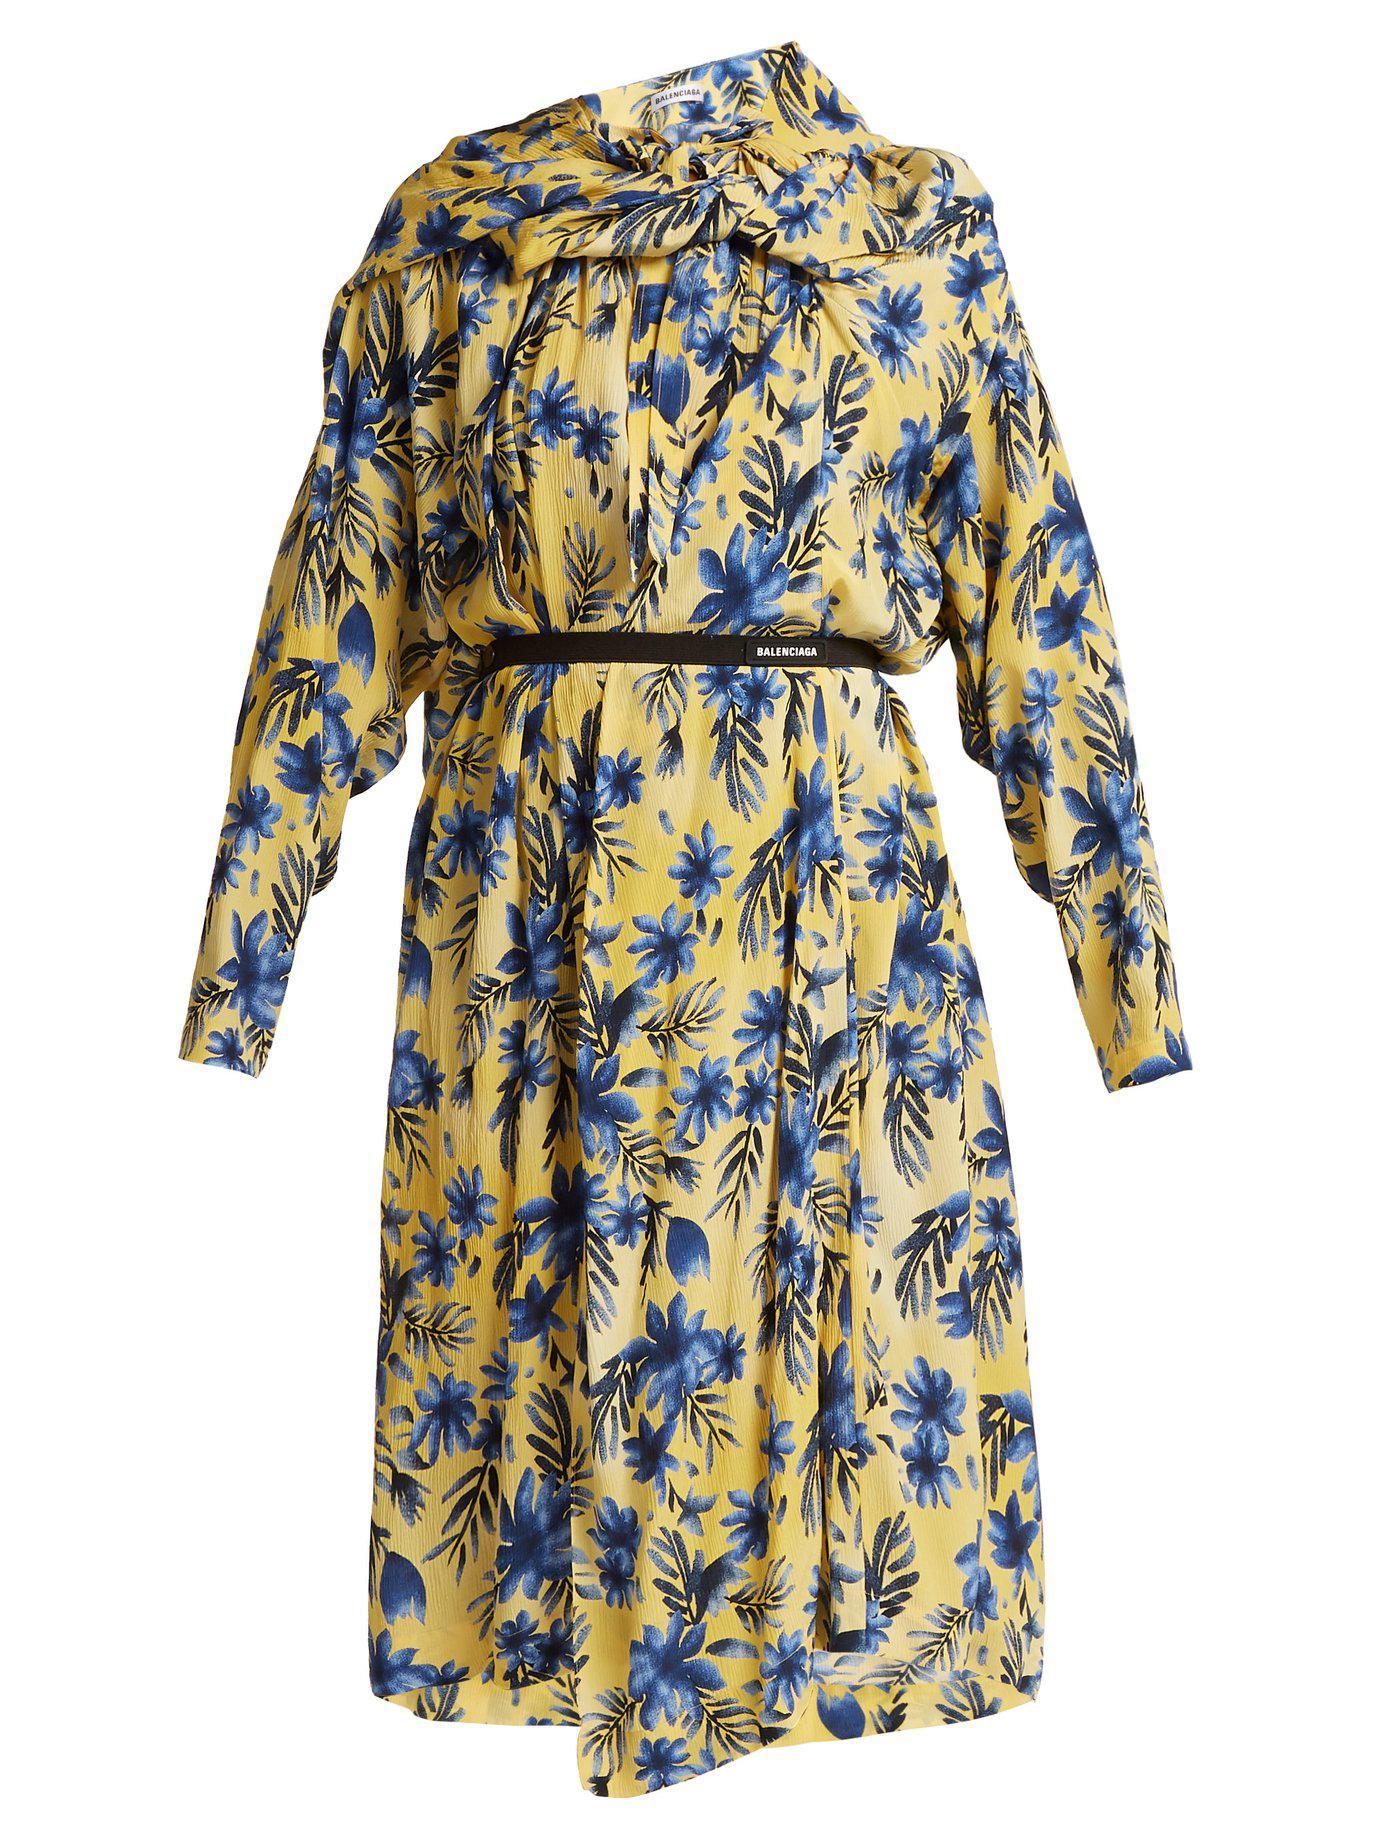 75baeb518c88 Balenciaga - Multicolor Floral Print Silk Dress - Lyst. View fullscreen